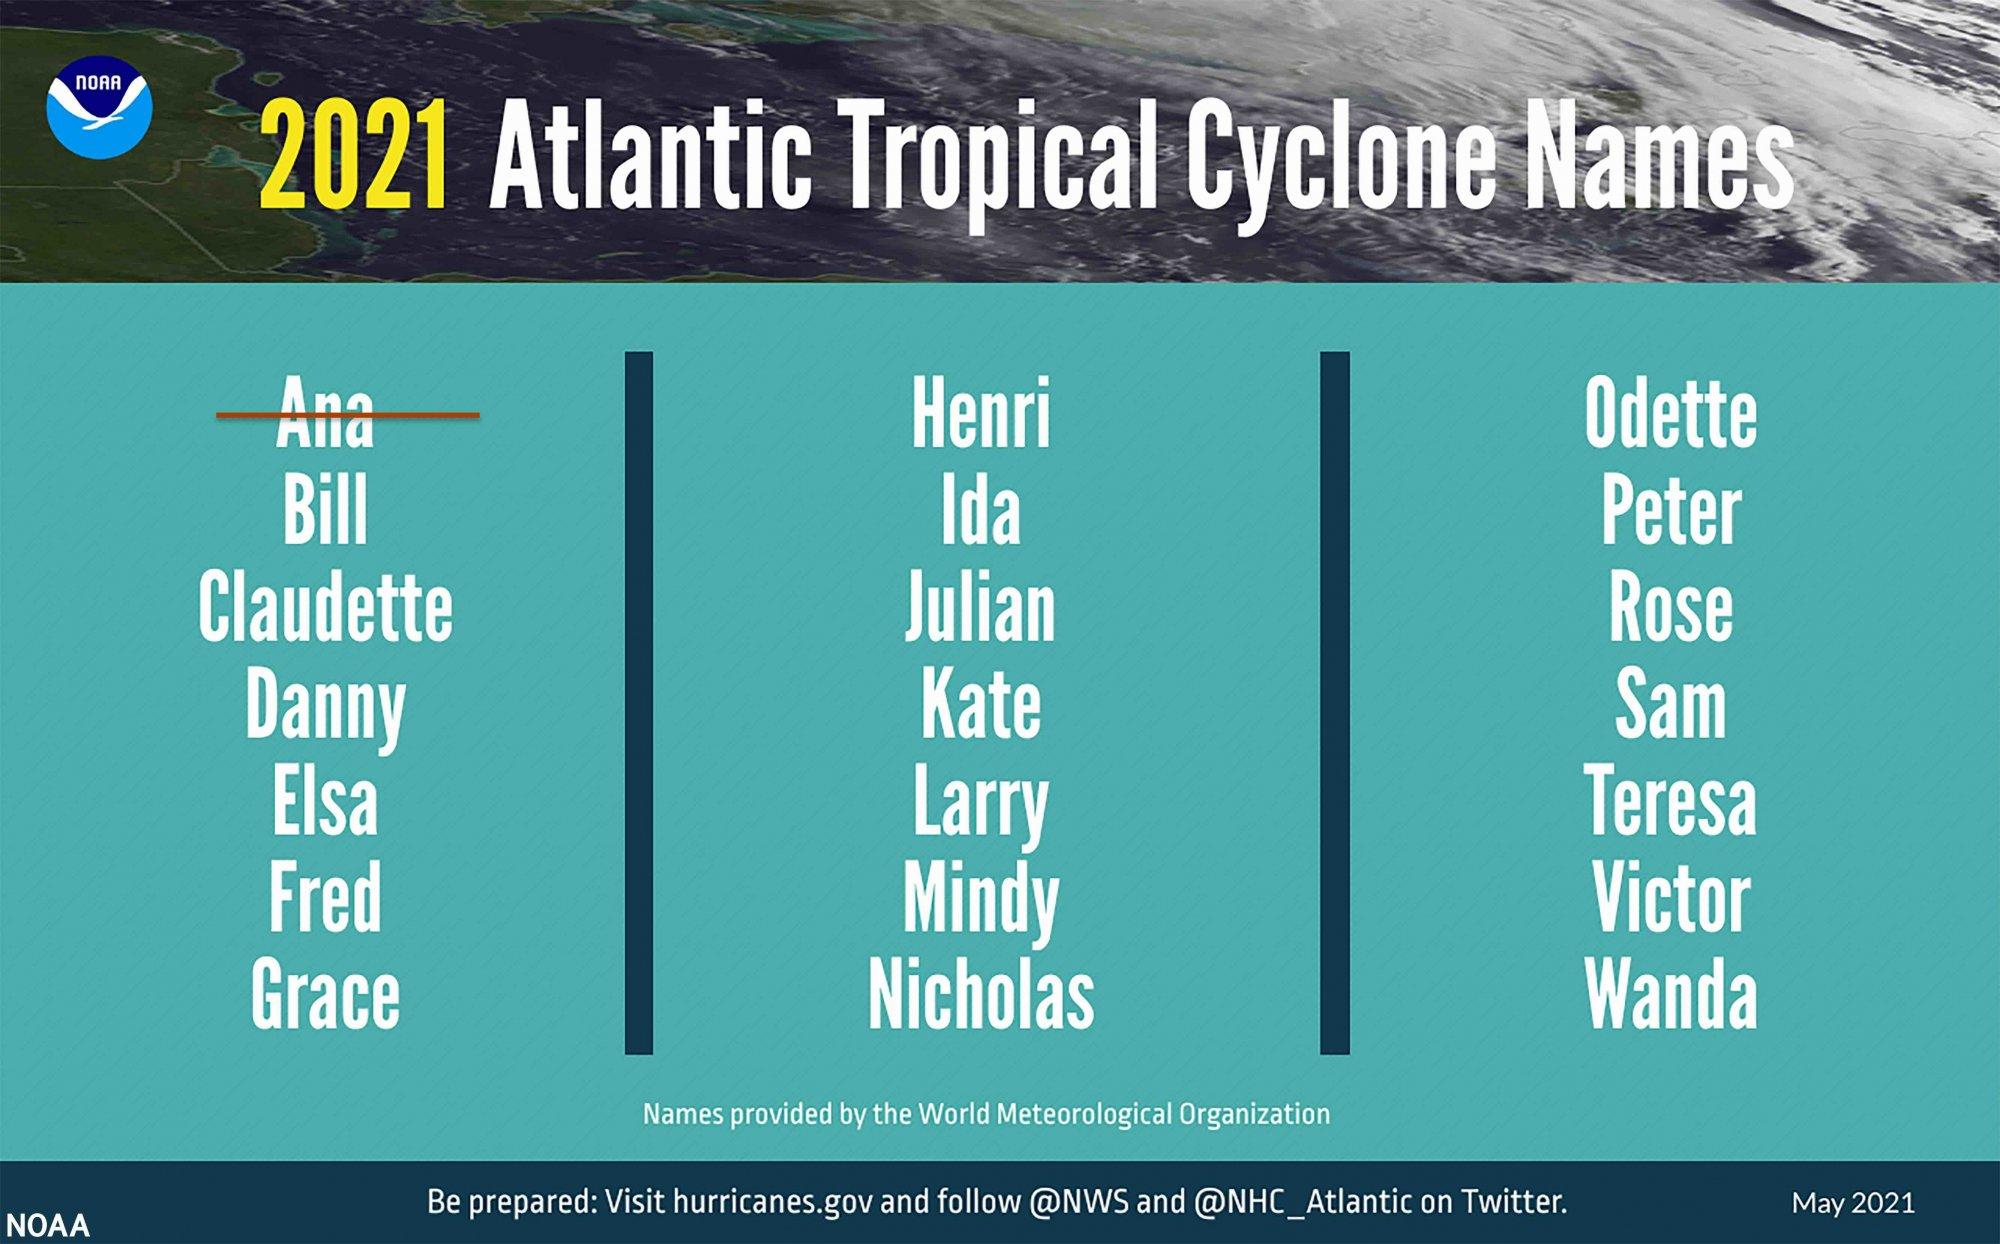 GRAPHIC-2021-Hurricane-Outlook-names-052021-5333x3317-highres.jpg